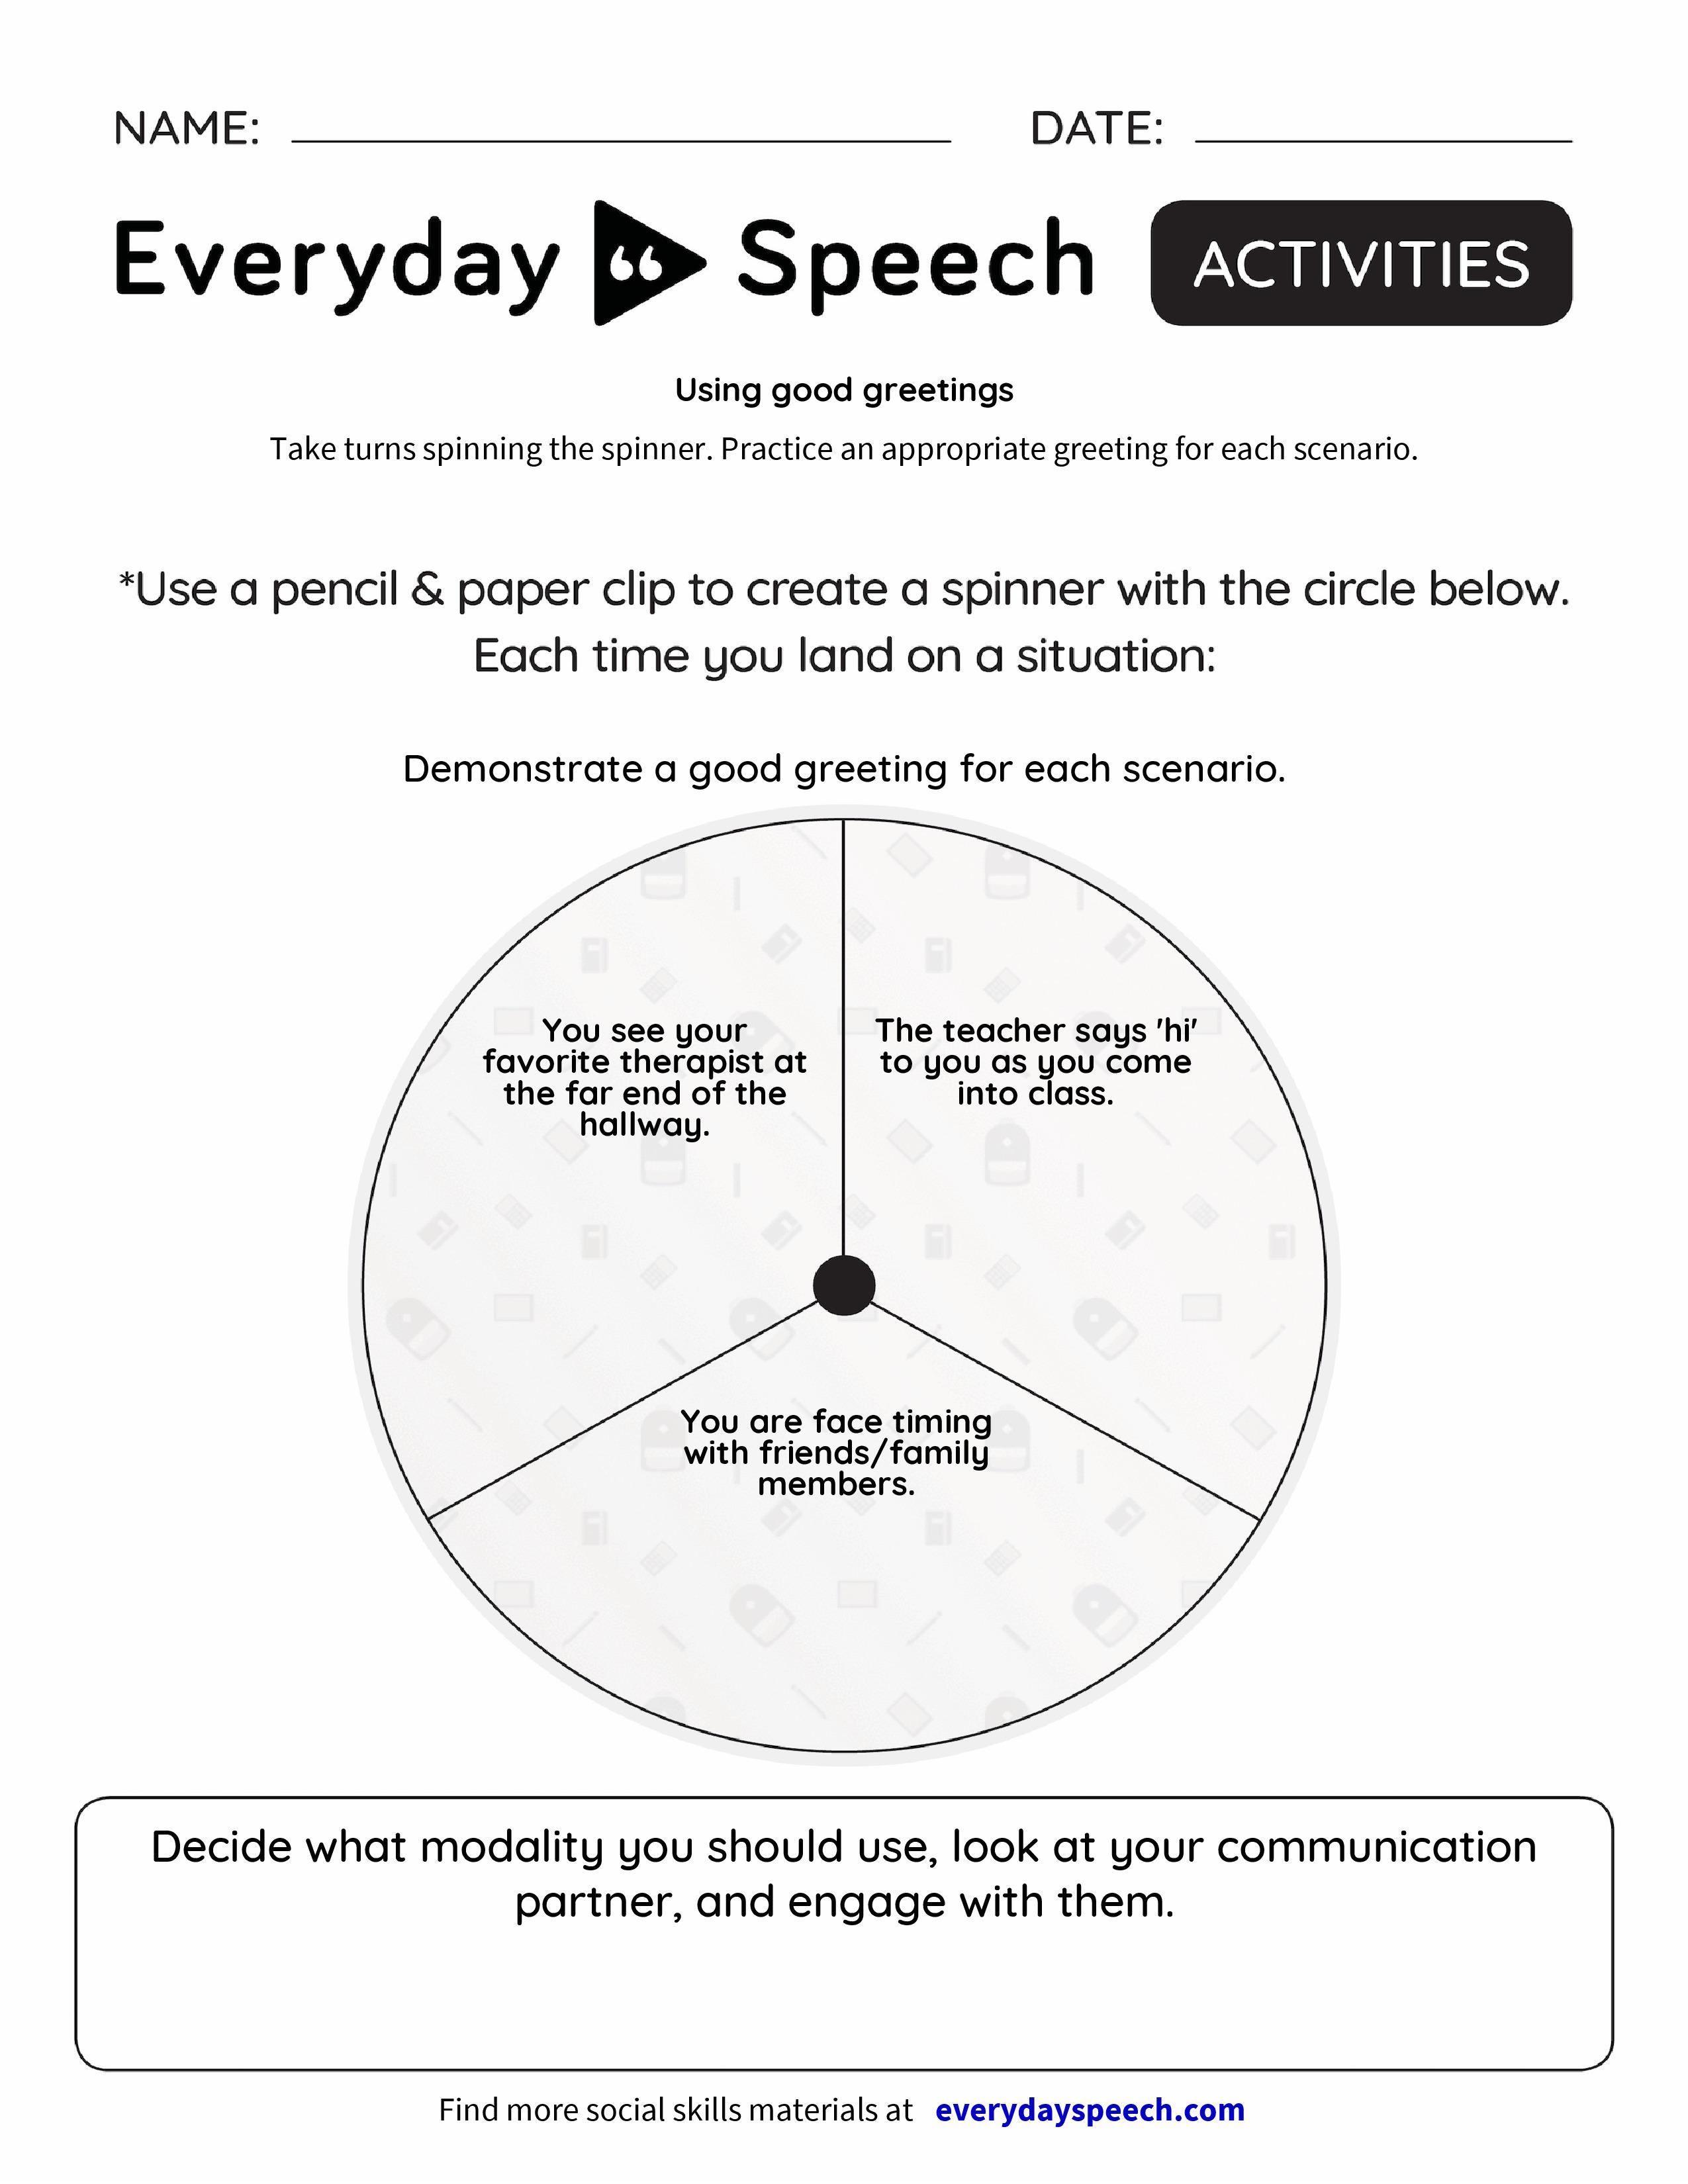 Using Good Greetings Everyday Speech Everyday Speech